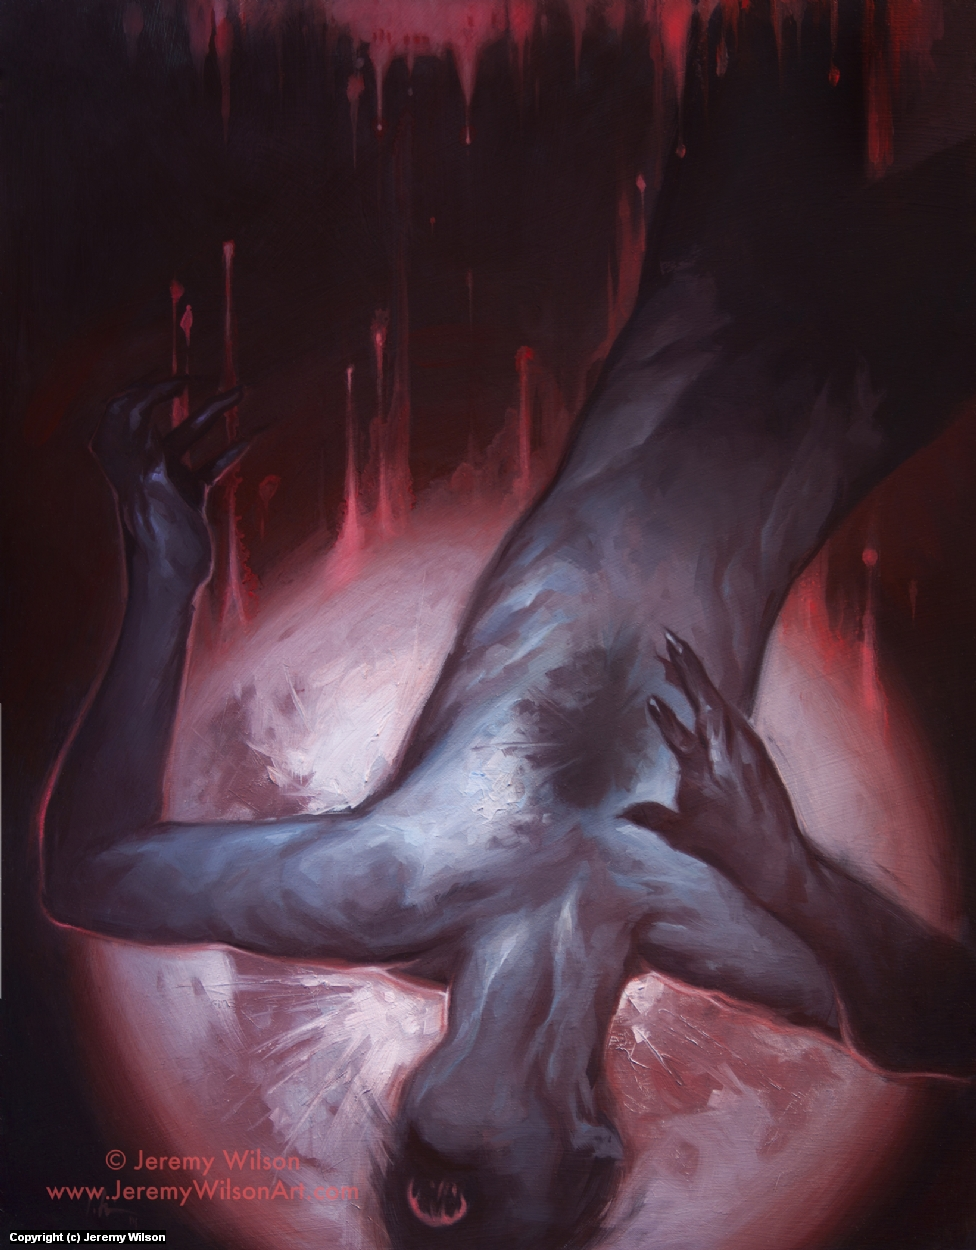 Dracula Artwork by Jeremy Wilson